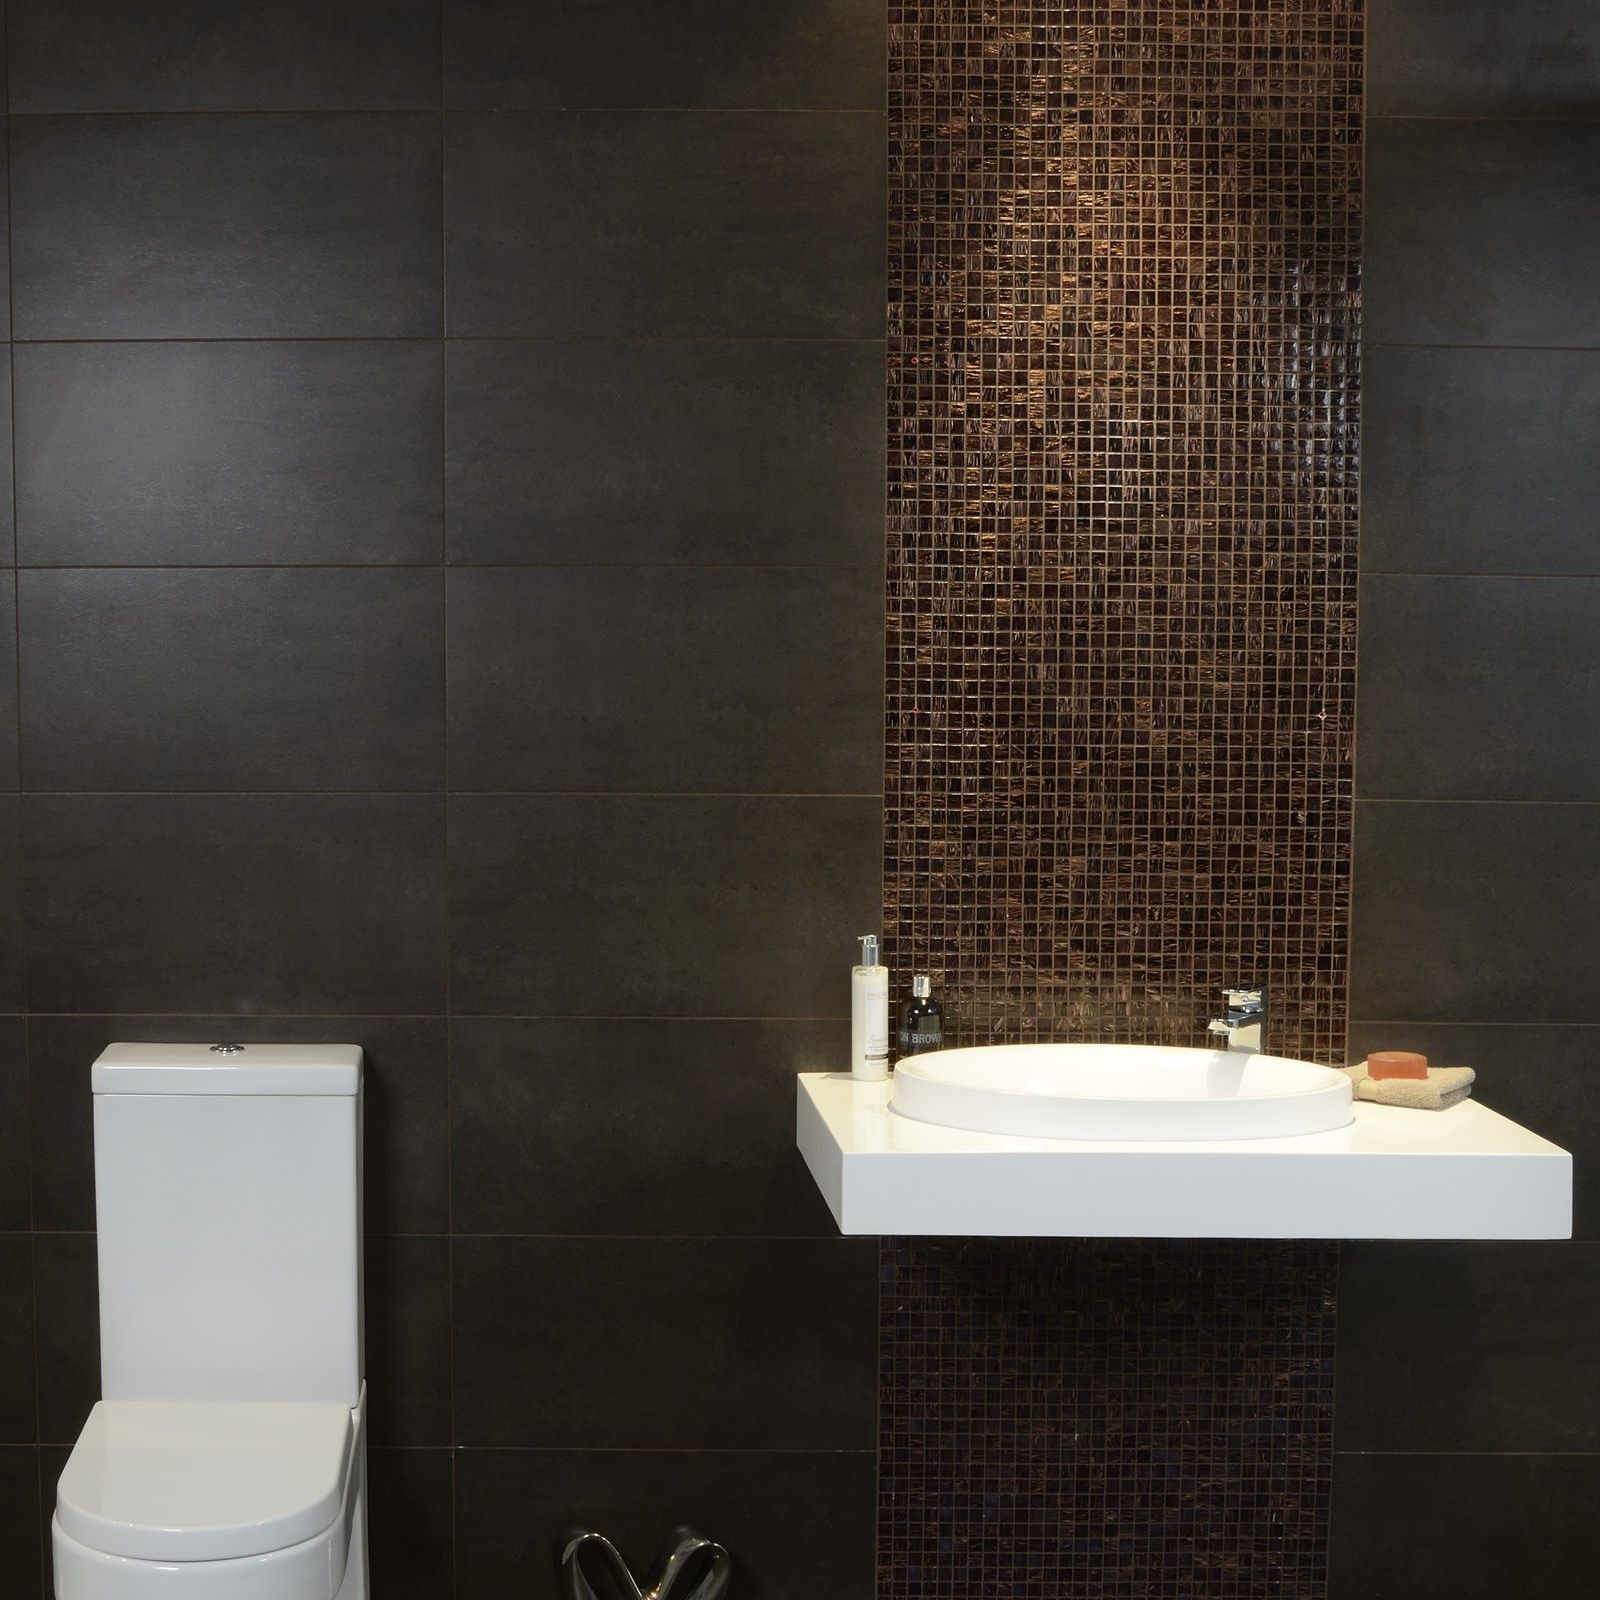 Epsilon Mocha Wall And Floor Tile Spring Bathroom Inspiration